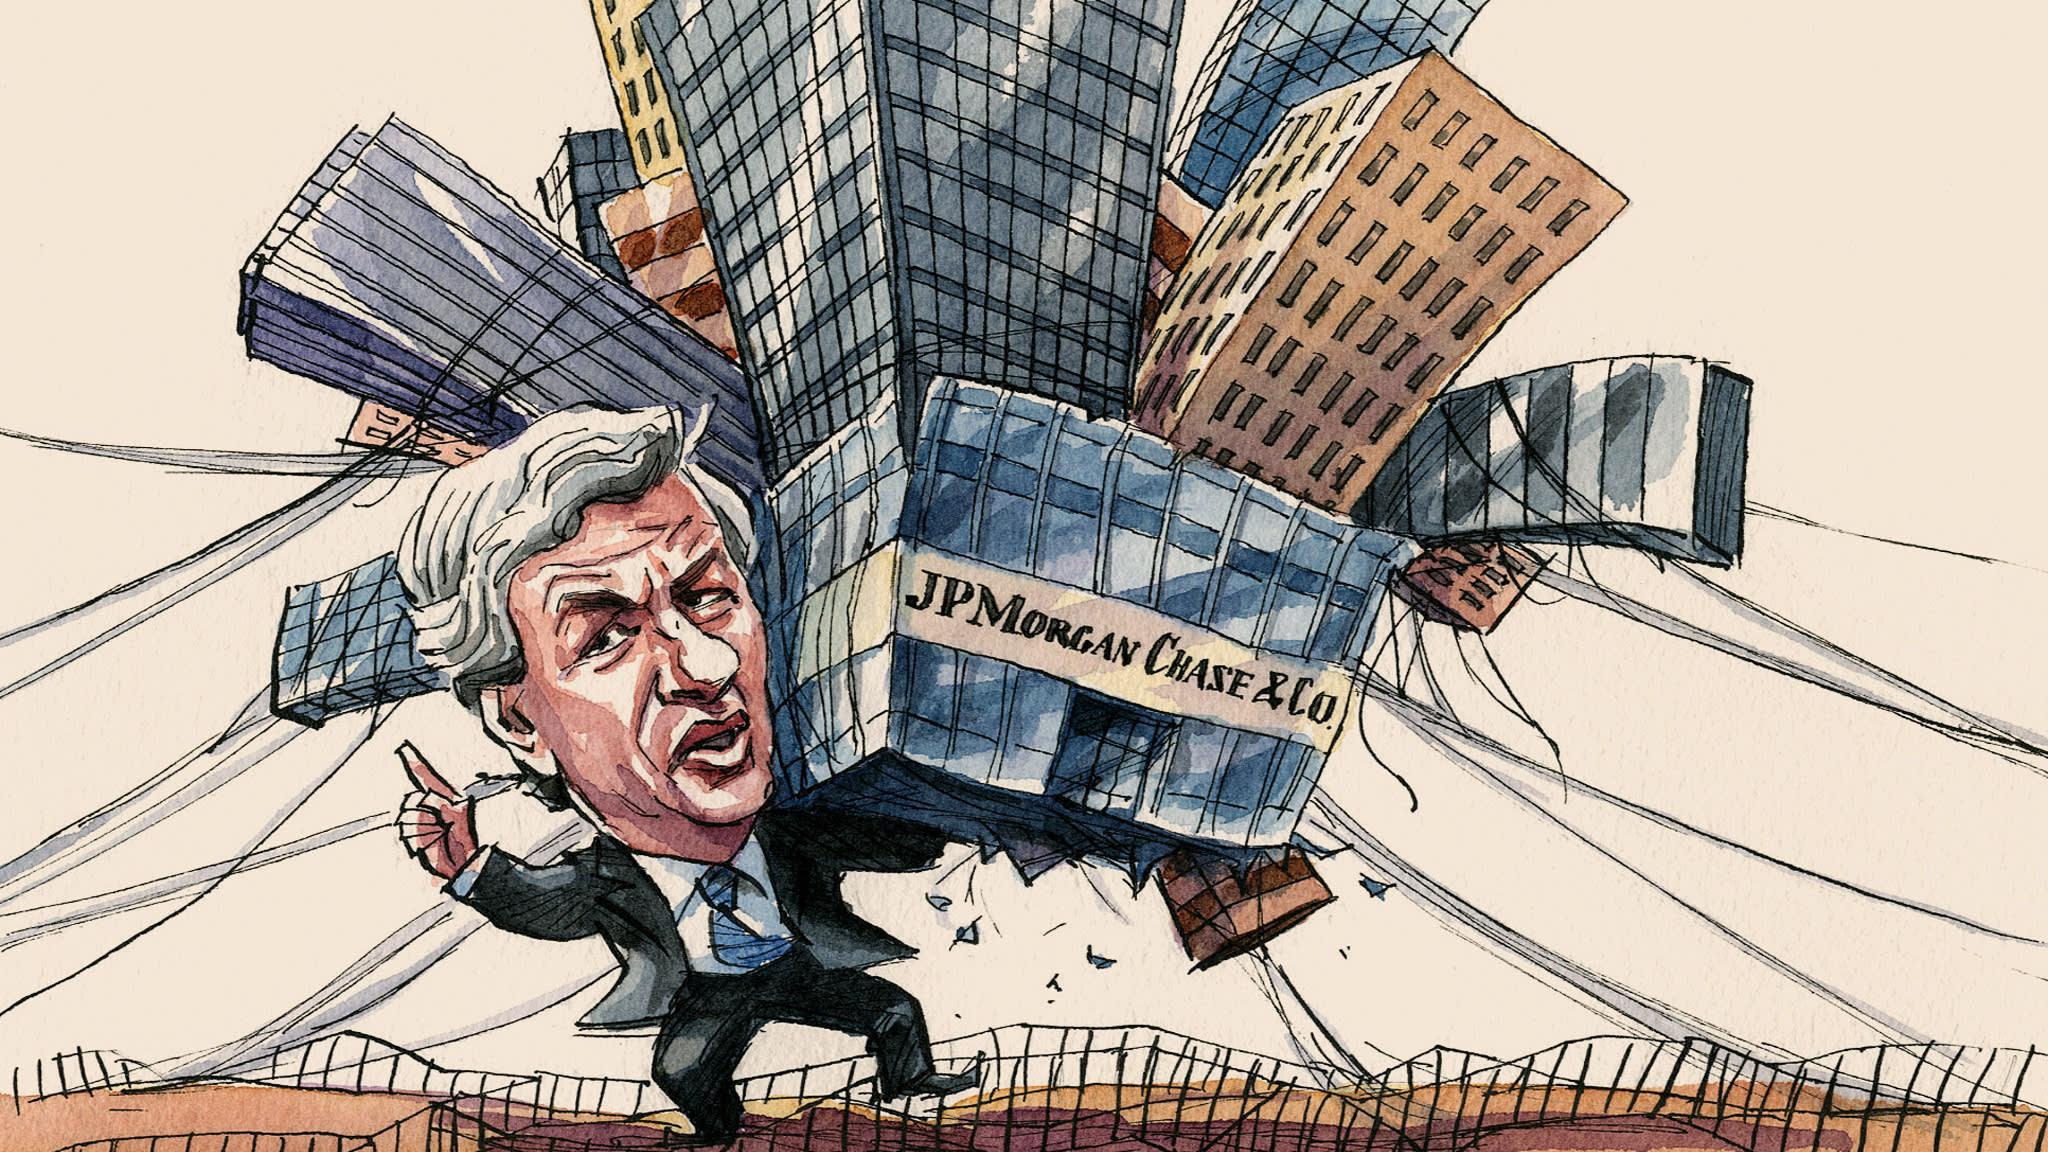 JPMorgan has made itself a target for regulators | Financial Times